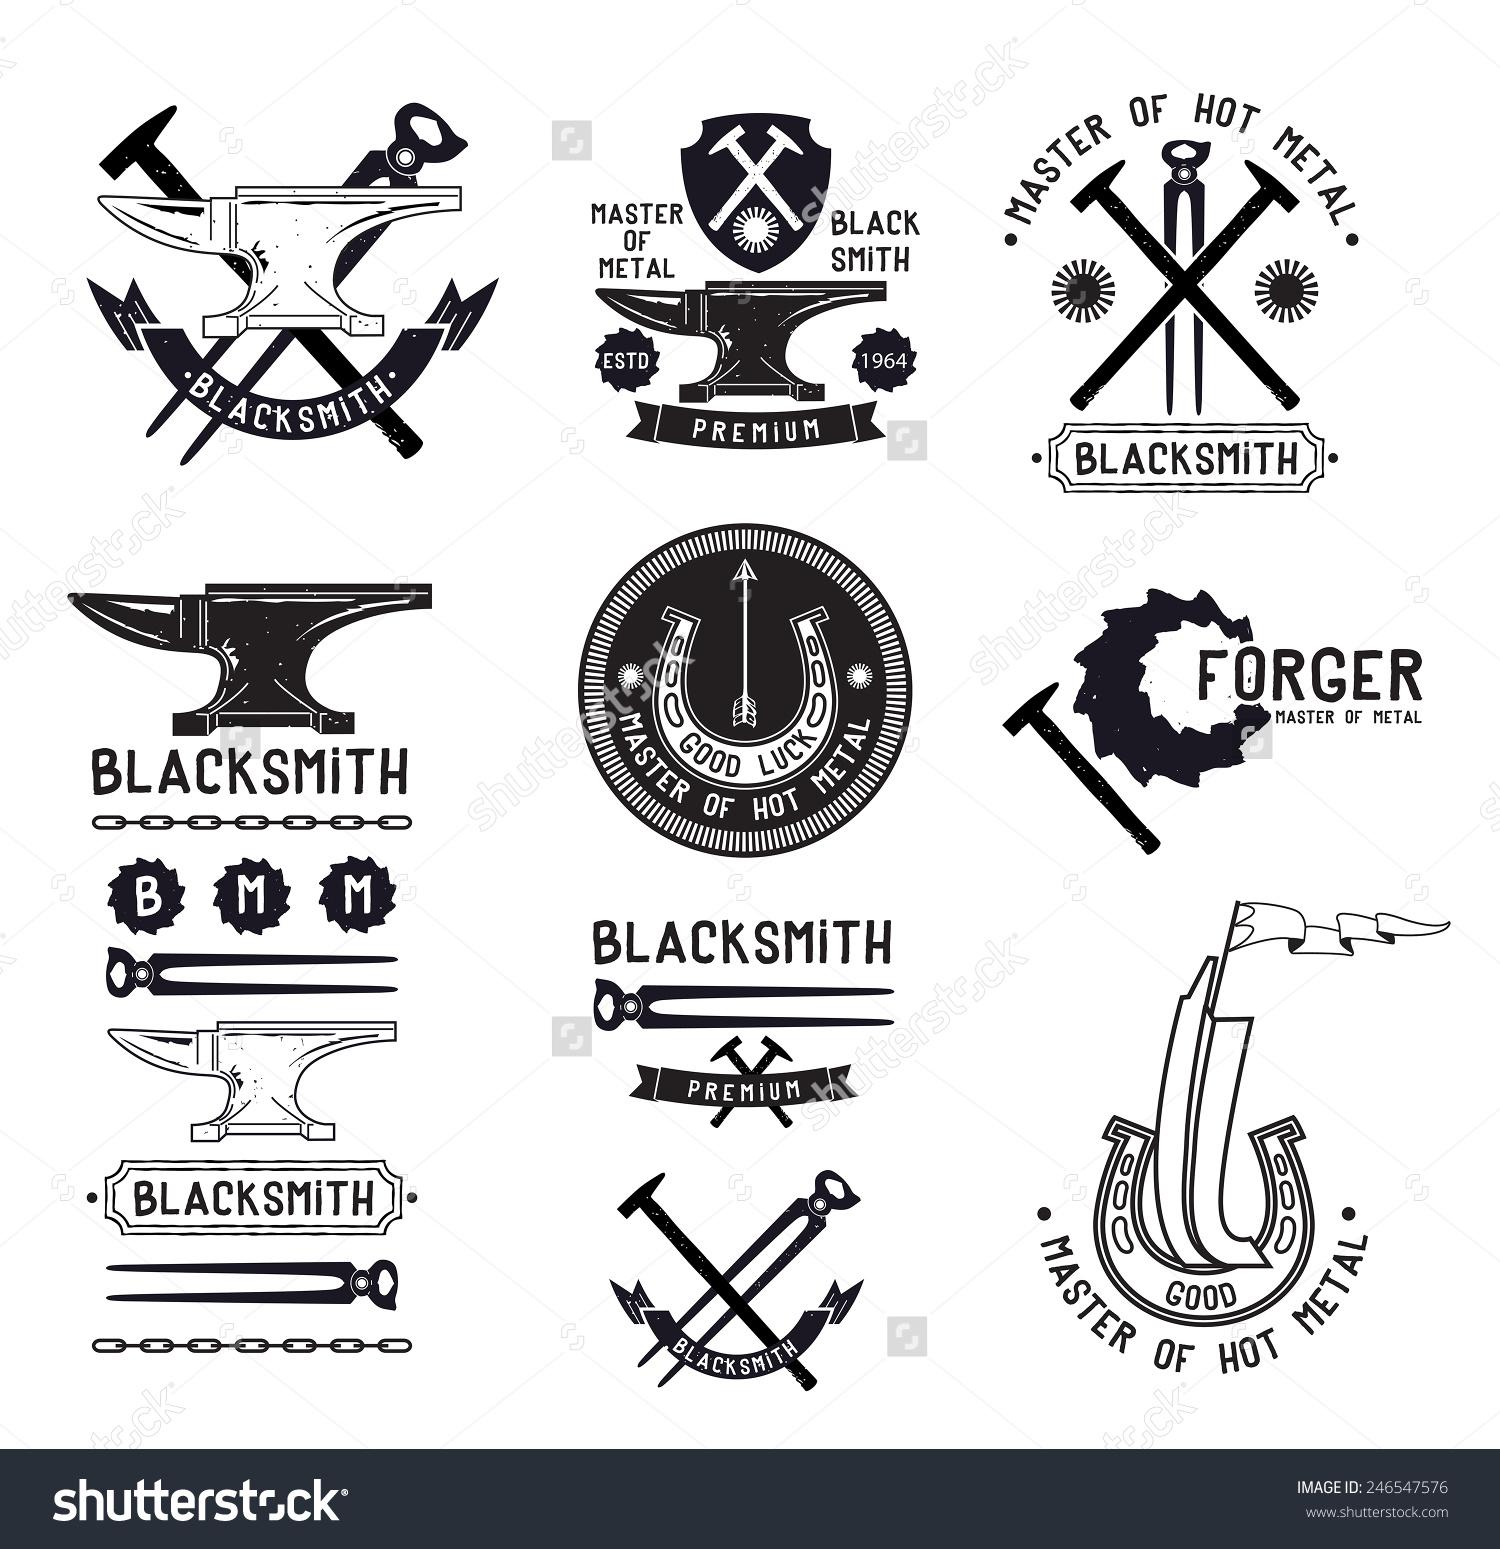 Blacksmith fabrication label chalkboard. Anvil clipart metallurgy